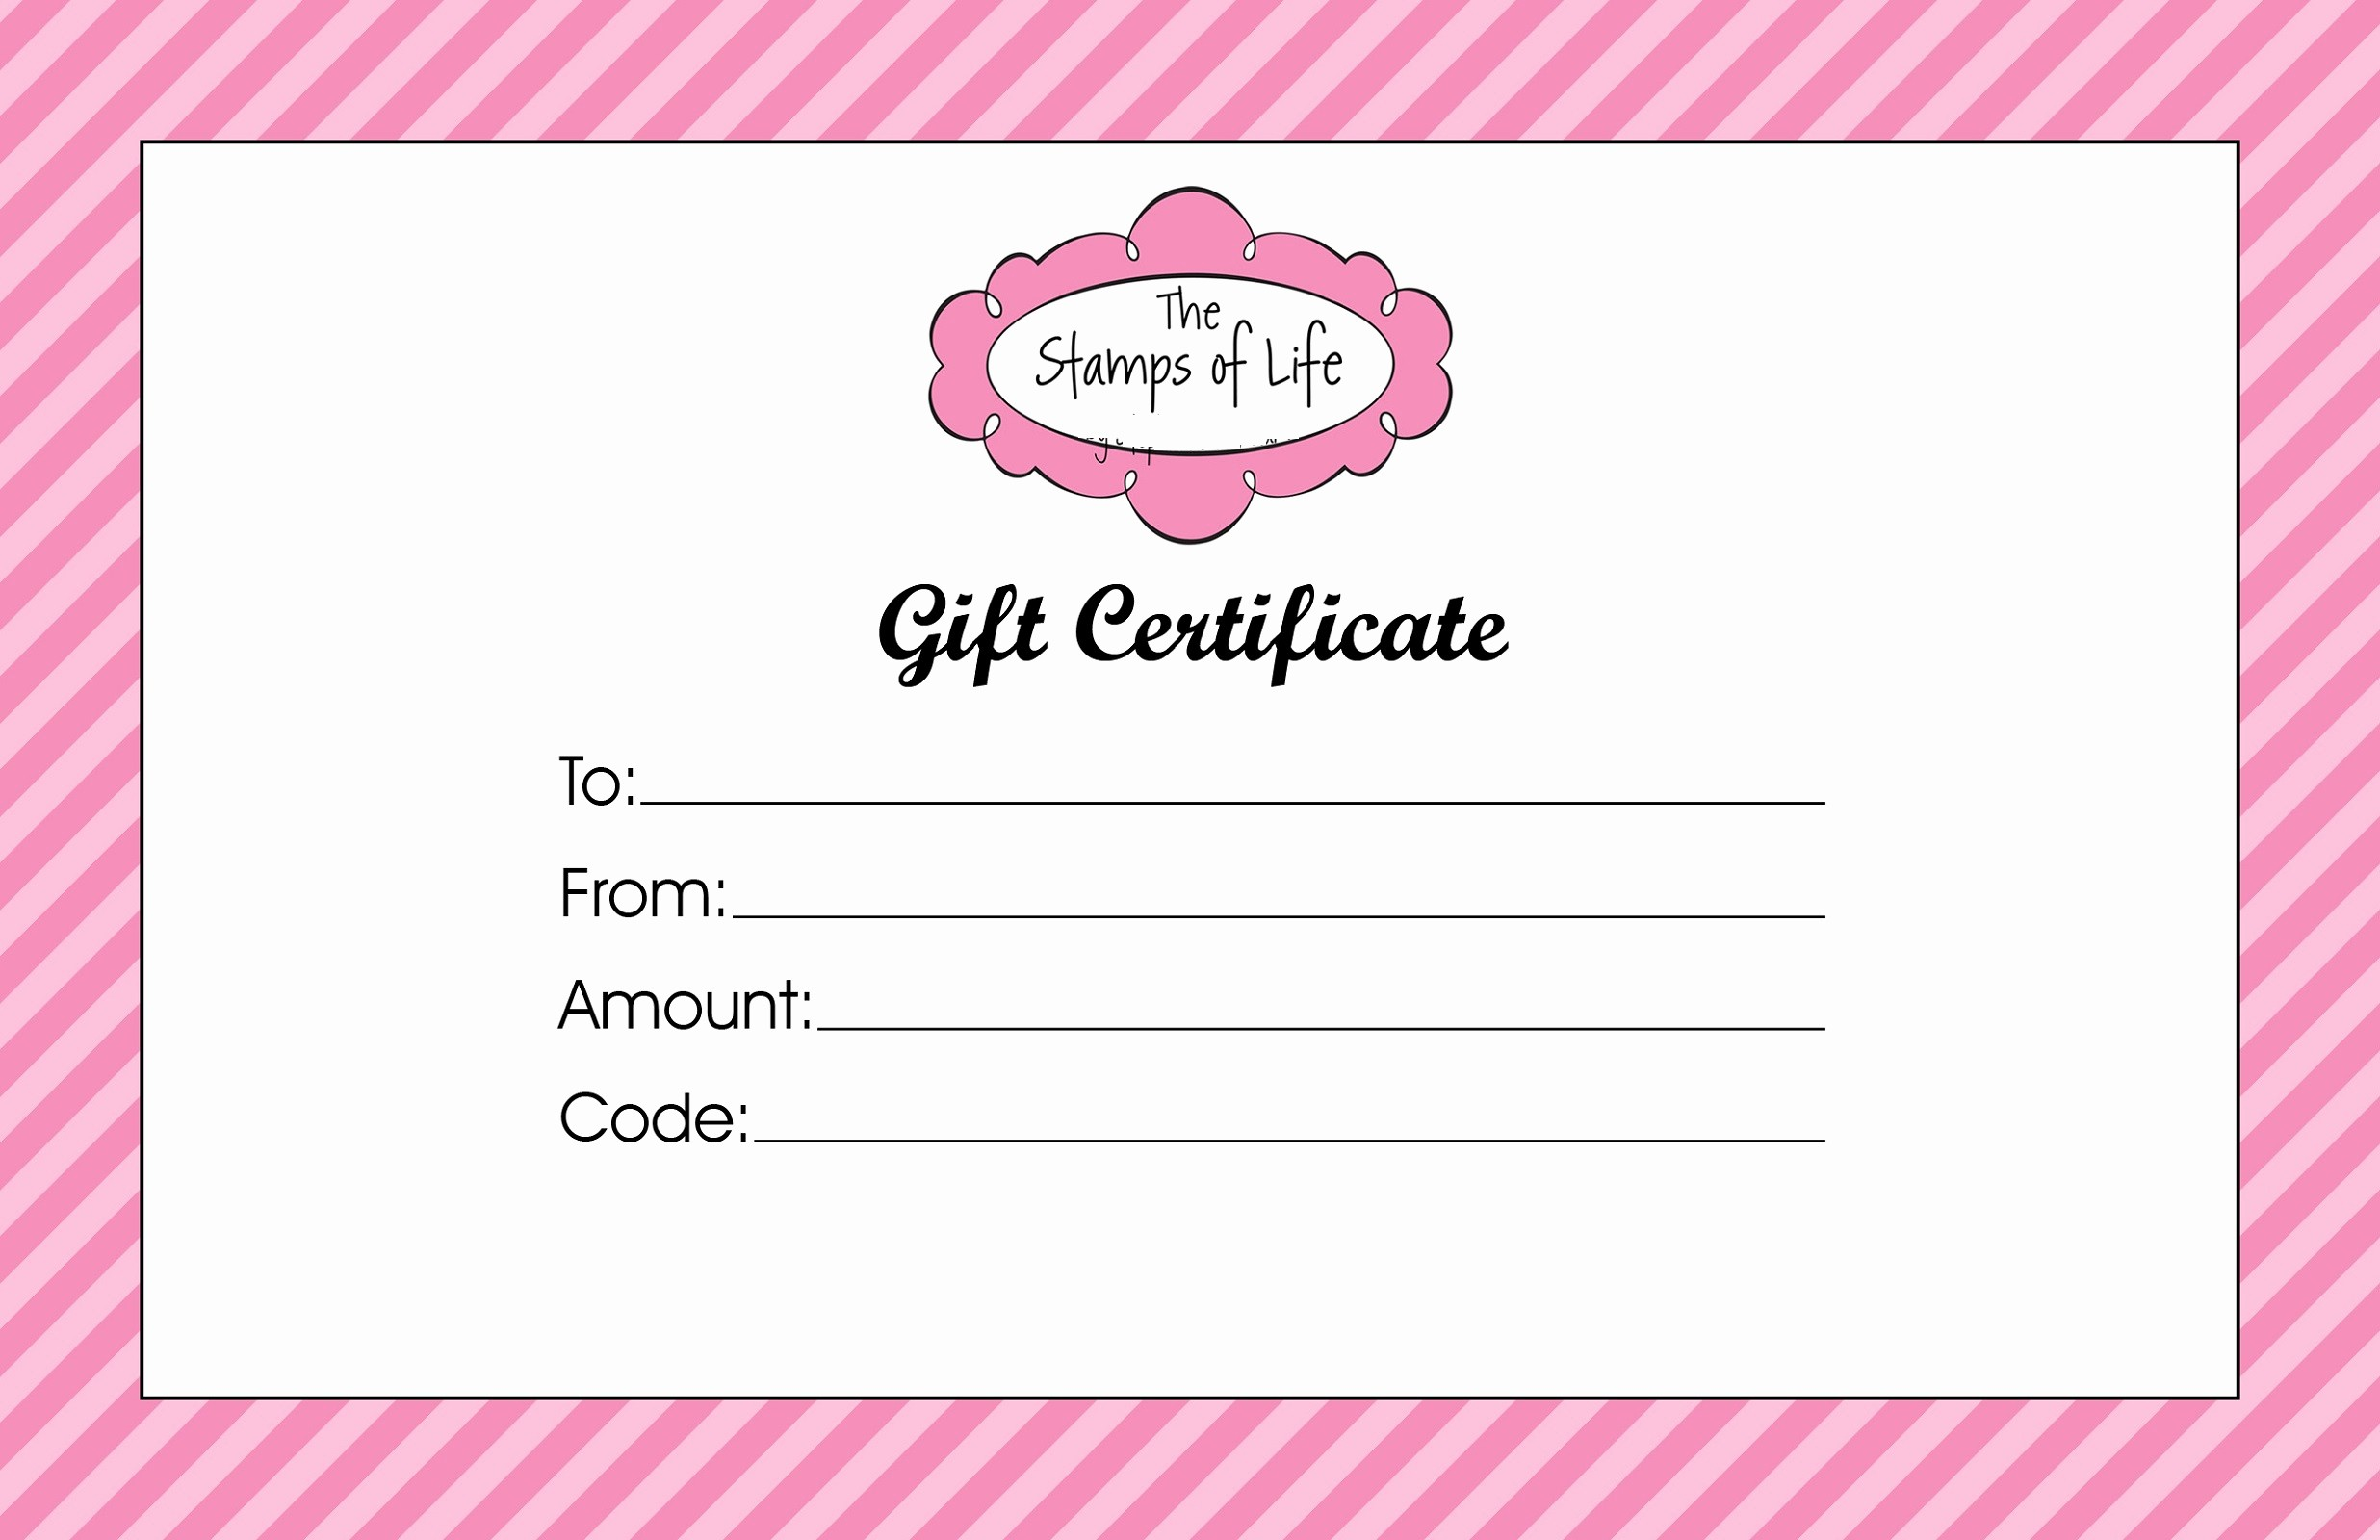 Print Gift Certificates Free Templates Elegant Gift Certificate Templates to Print